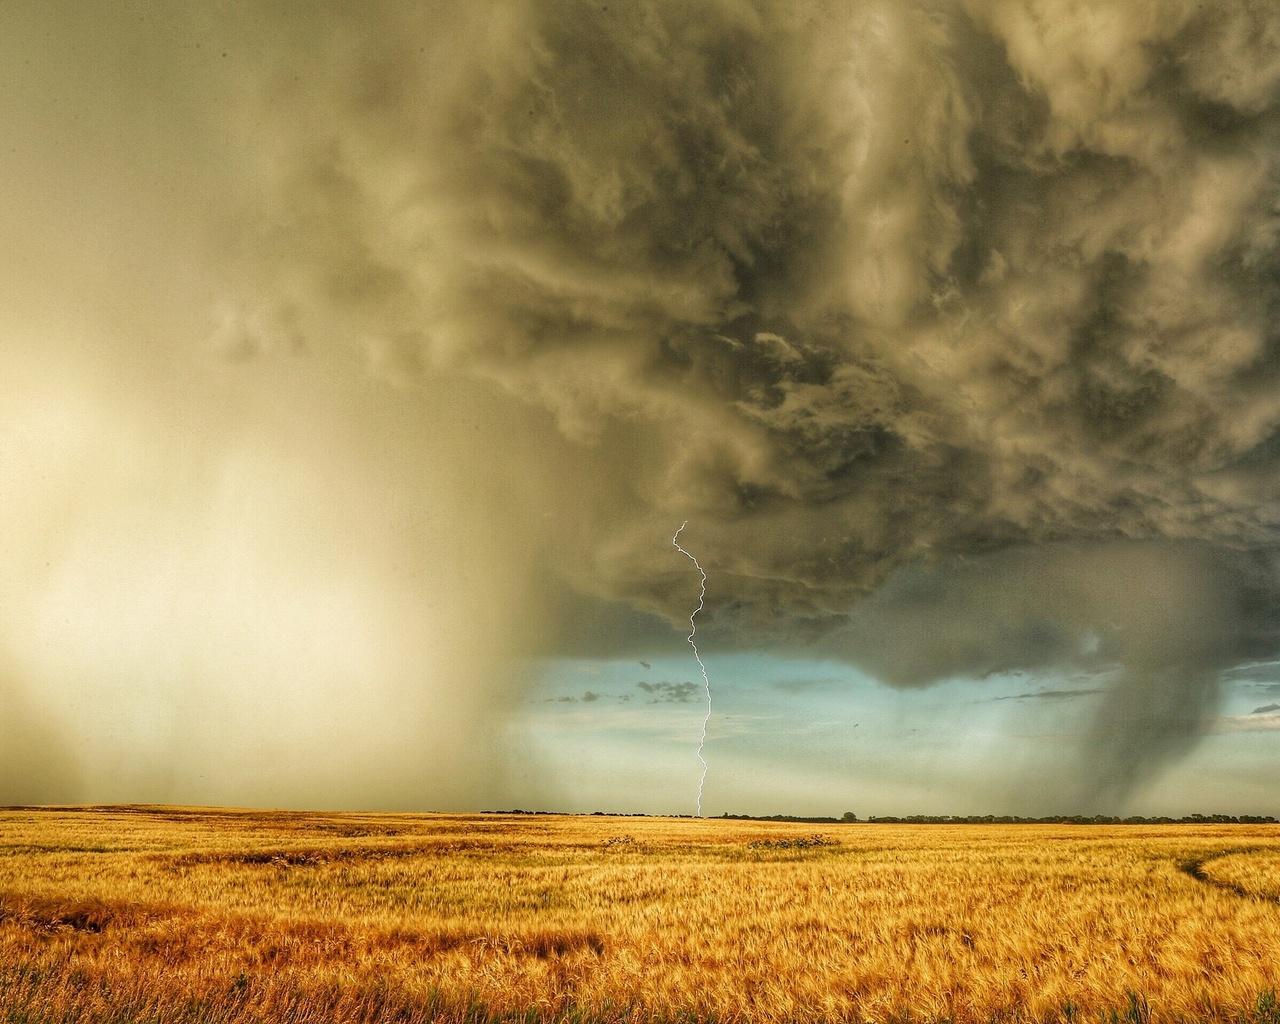 поле, гроза, молния